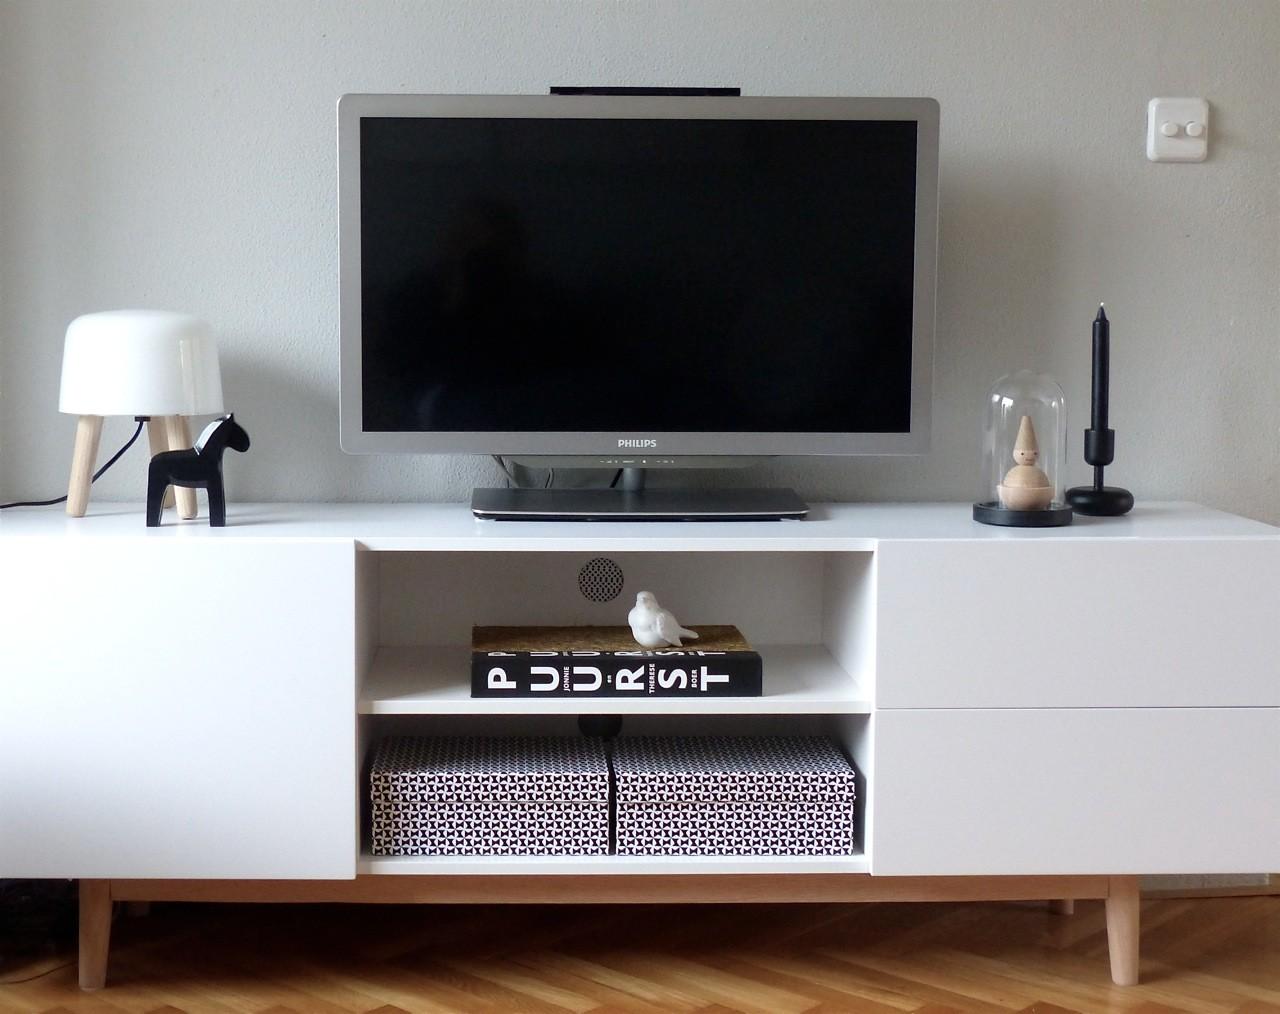 24designs tv meubel olavi wit aanbieding kopen - Console ingang kast lade ...